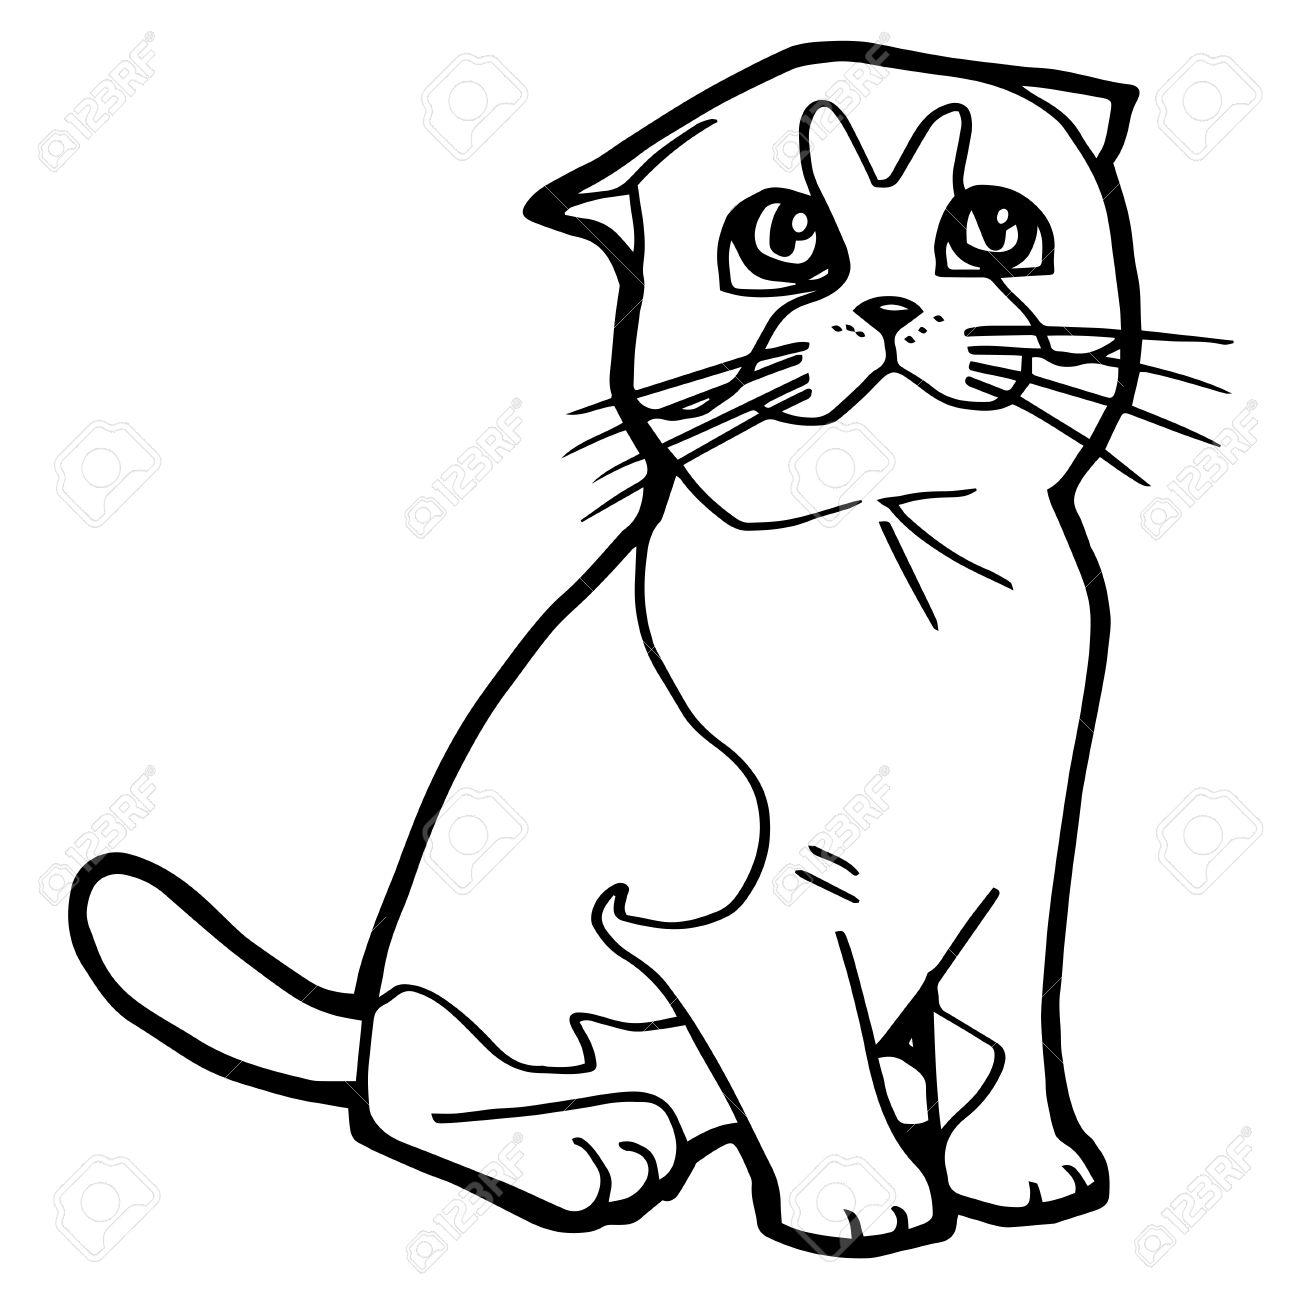 Excepcional Cuadro De Colorear Gato Modelo - Enmarcado Para Colorear ...